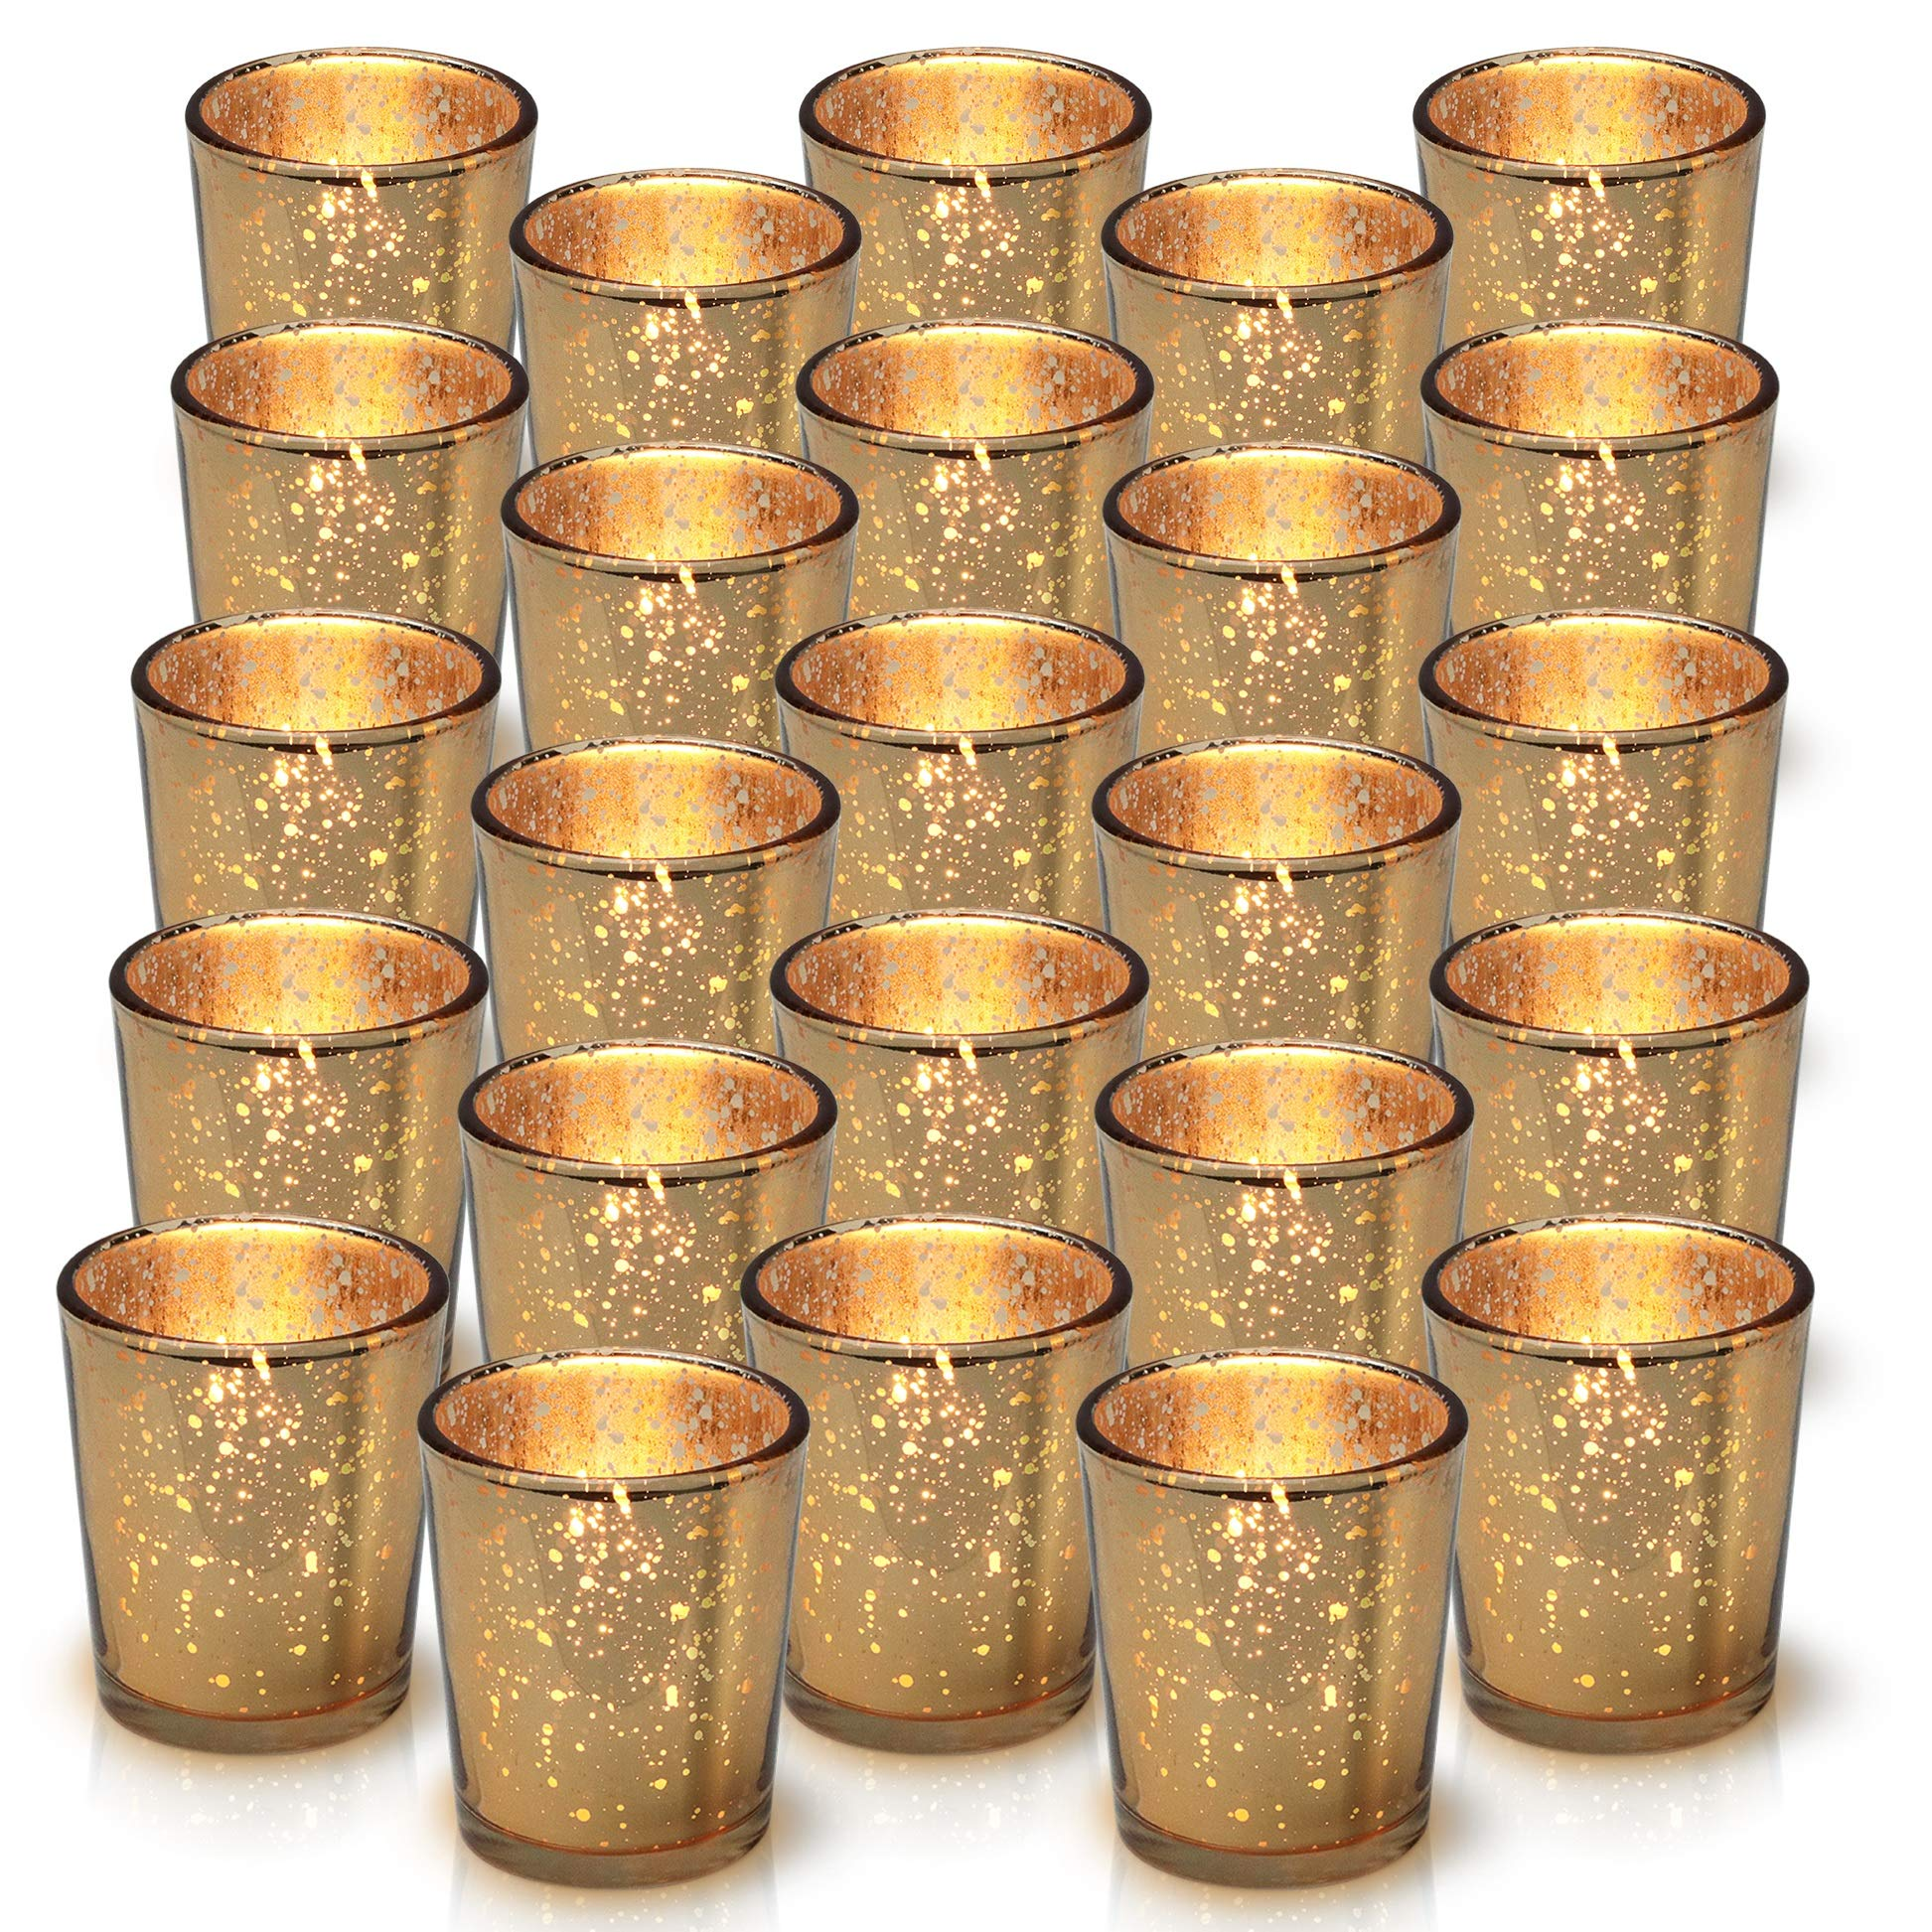 Granrosi Gold Mercury Votive Candle Holder Set Of 25 Made Of